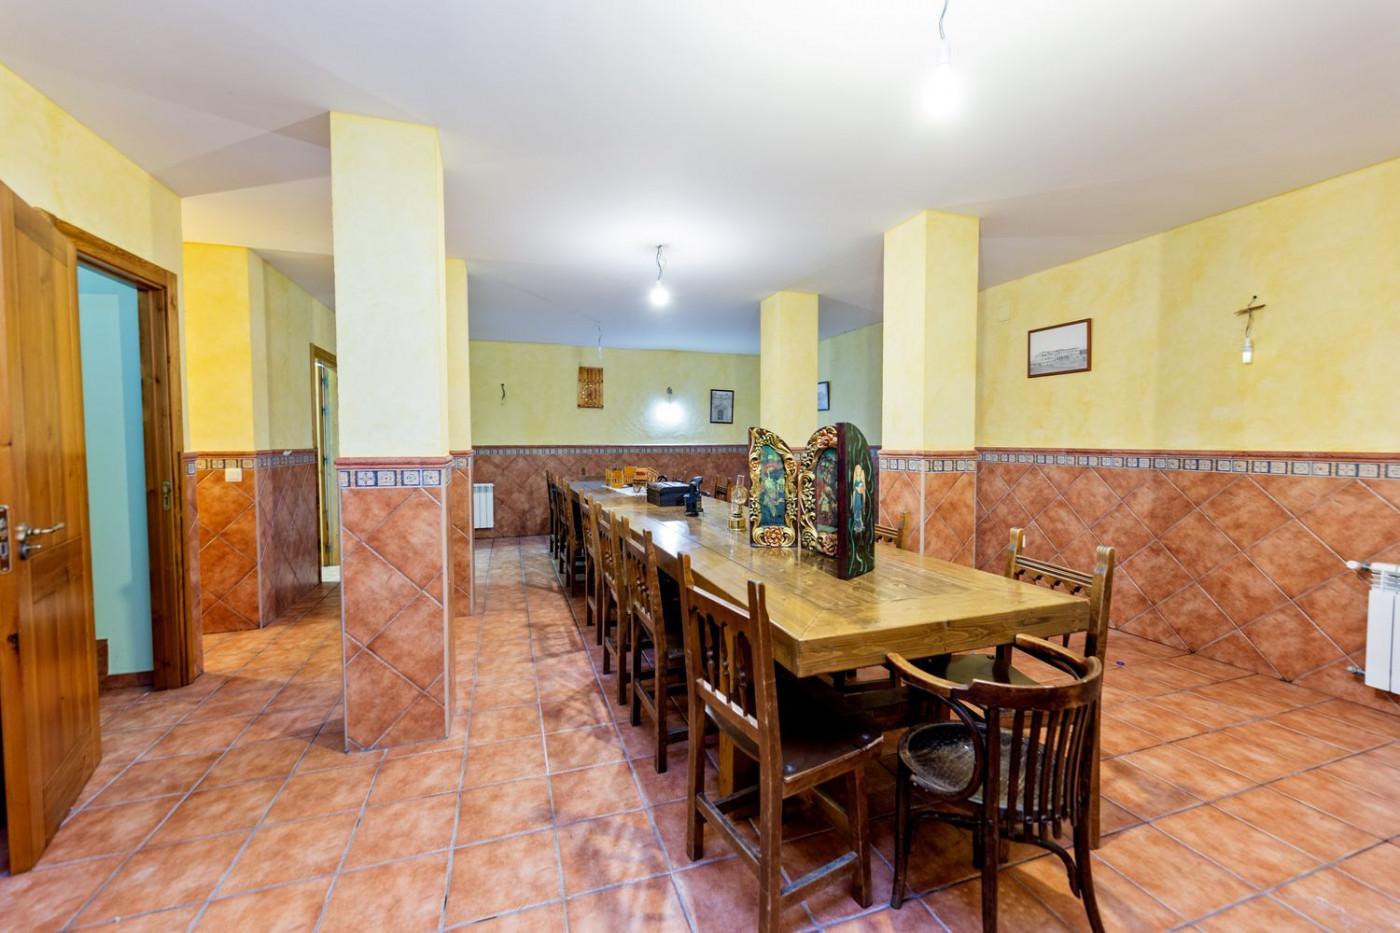 Chalet individual en venta, Pinarejo, Cantalejo